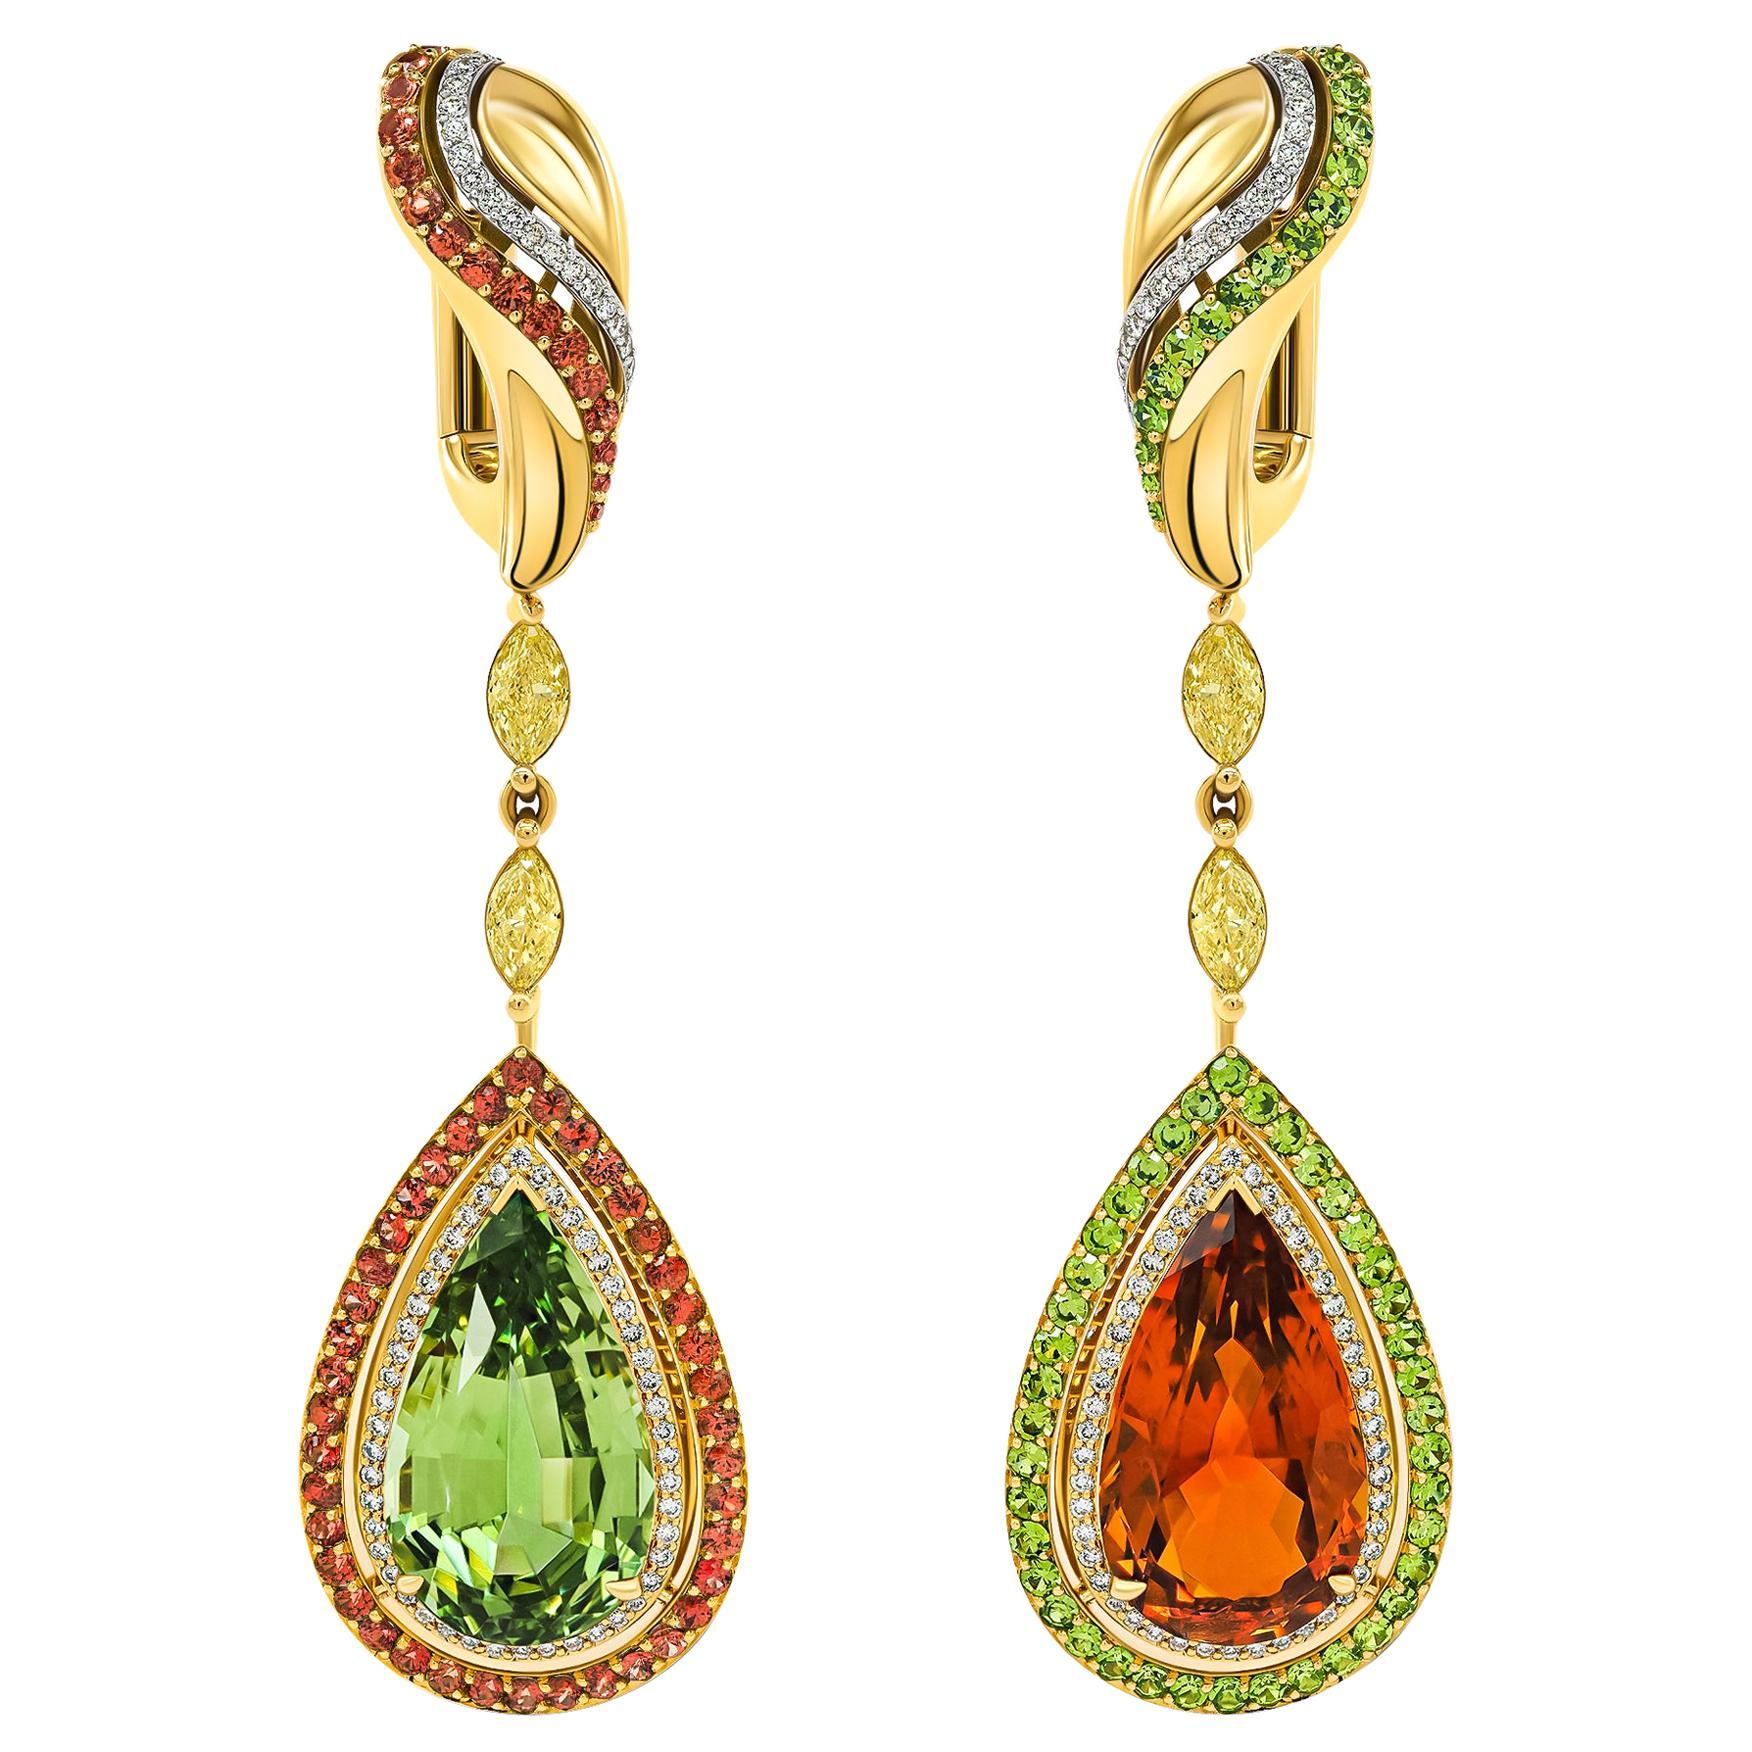 Tsavorite & Clinohumite Earrings Set, 18k Yellow Gold & Diamonds Earrings